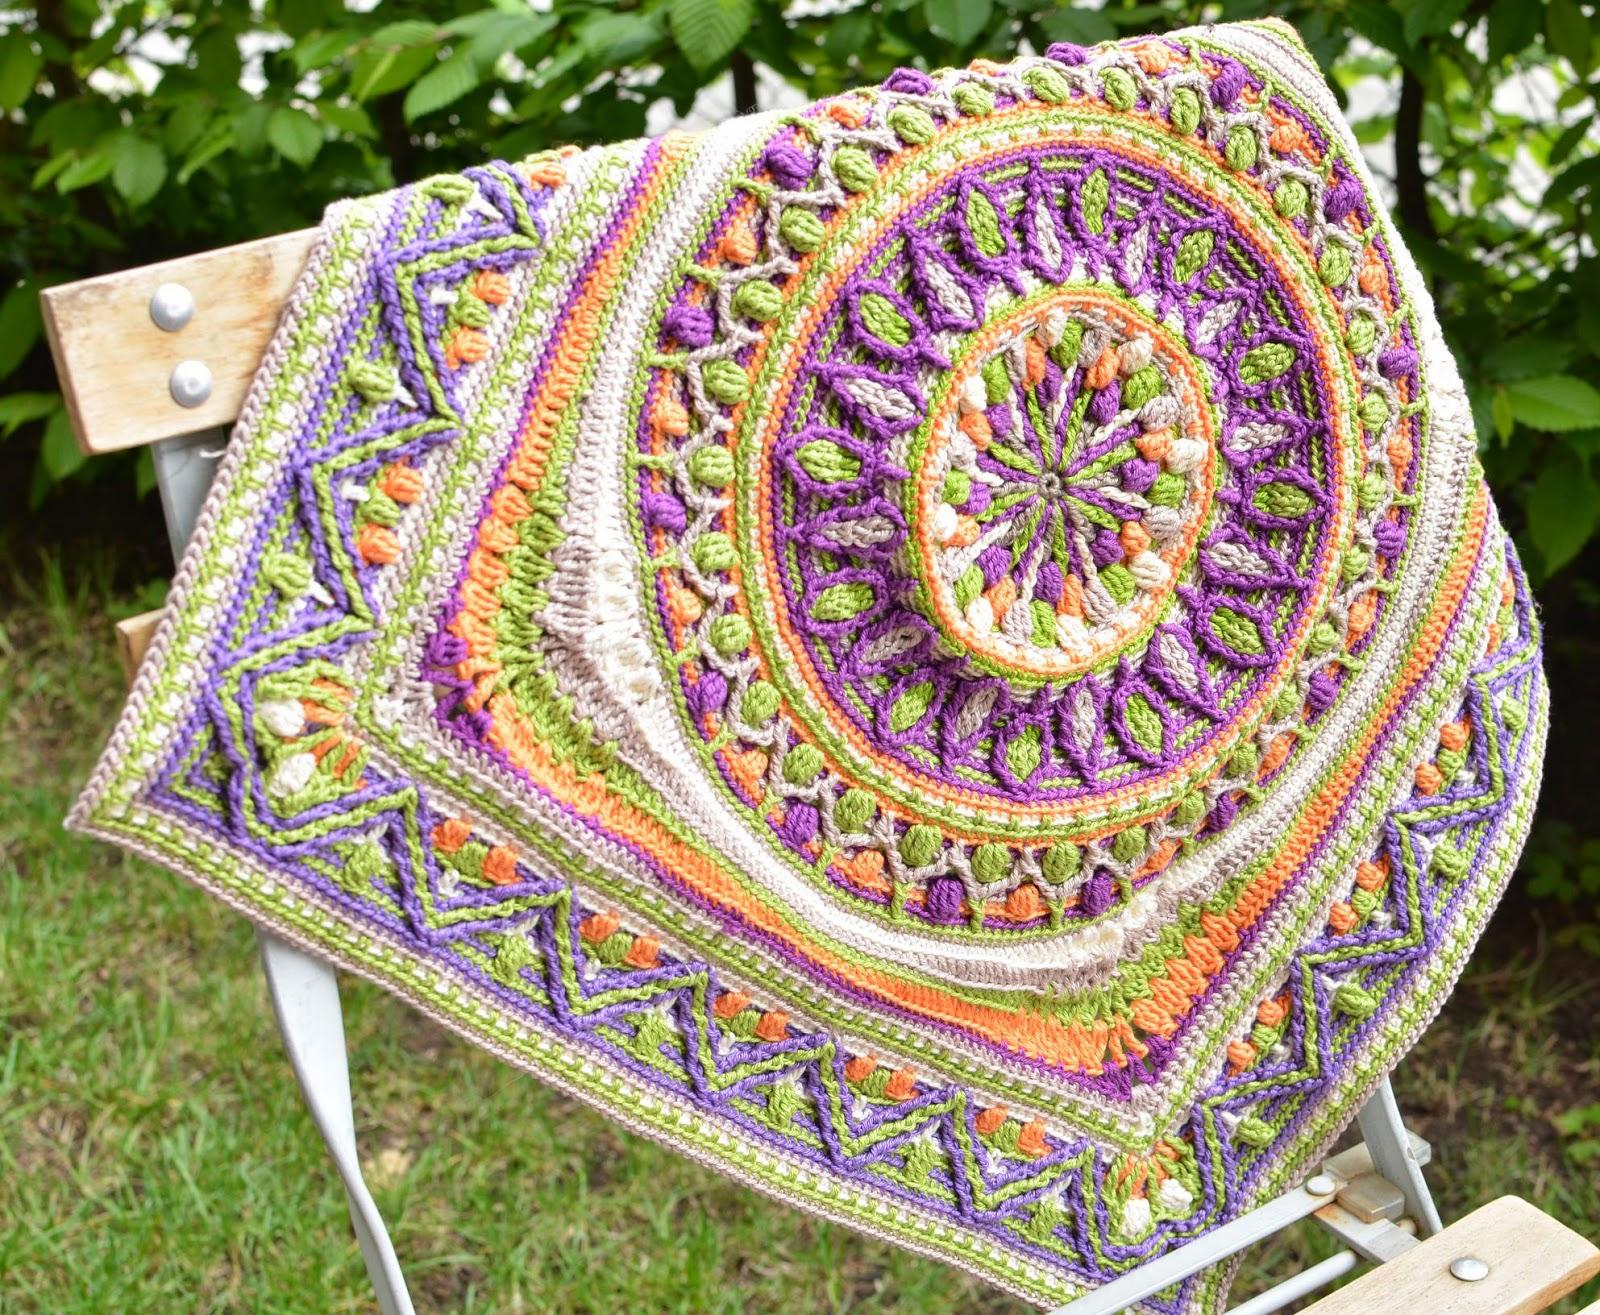 Large Crochet Squares Or Second Life Of Dandelion Mandala